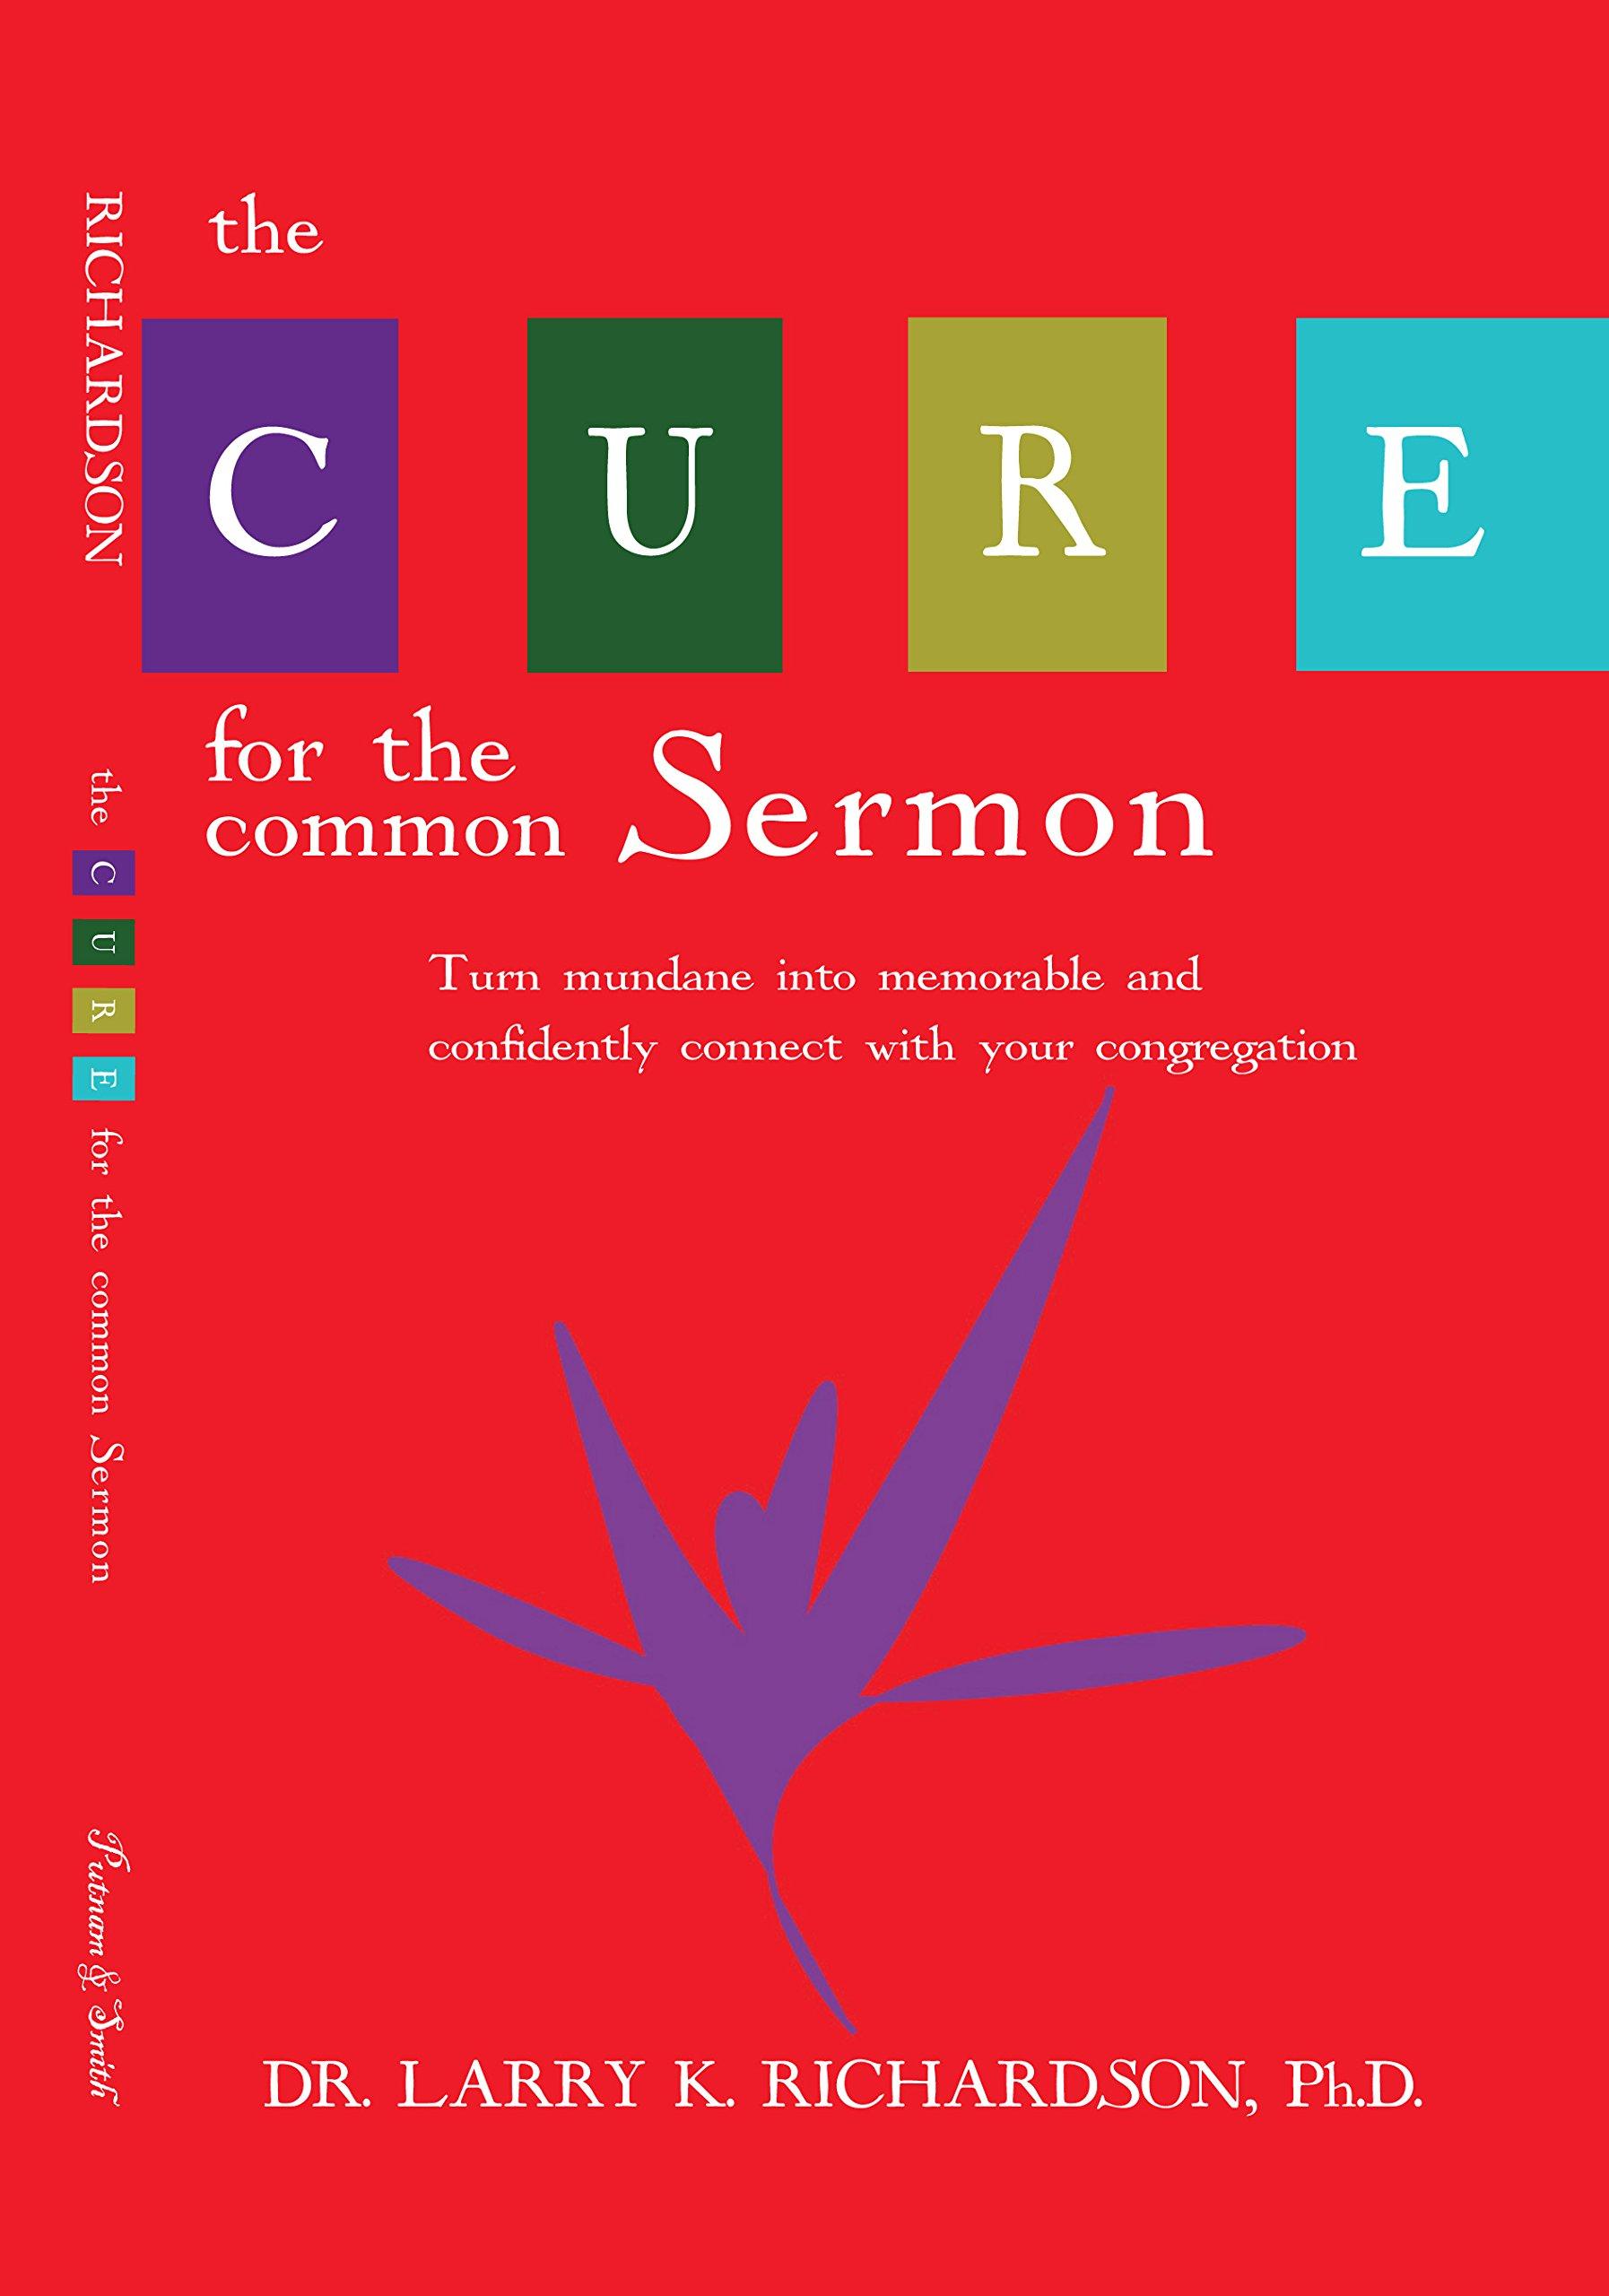 The Cure for the Common Sermon ebook